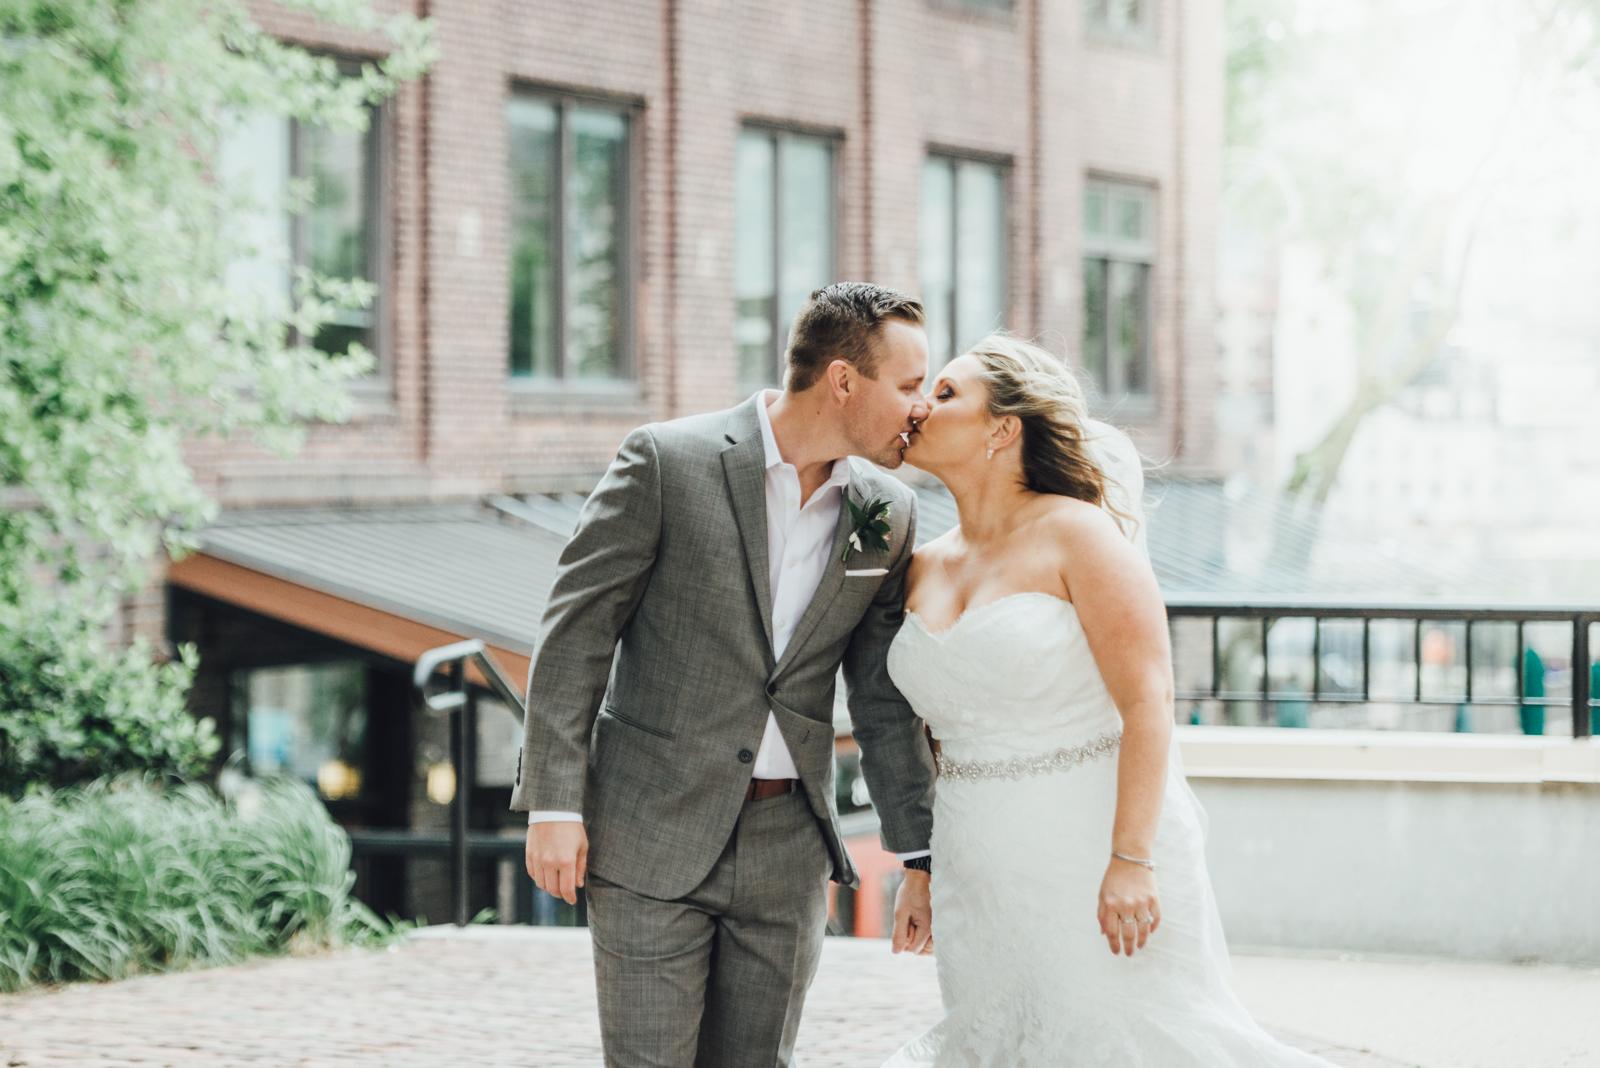 Amanda&Nick-wed-188.jpg